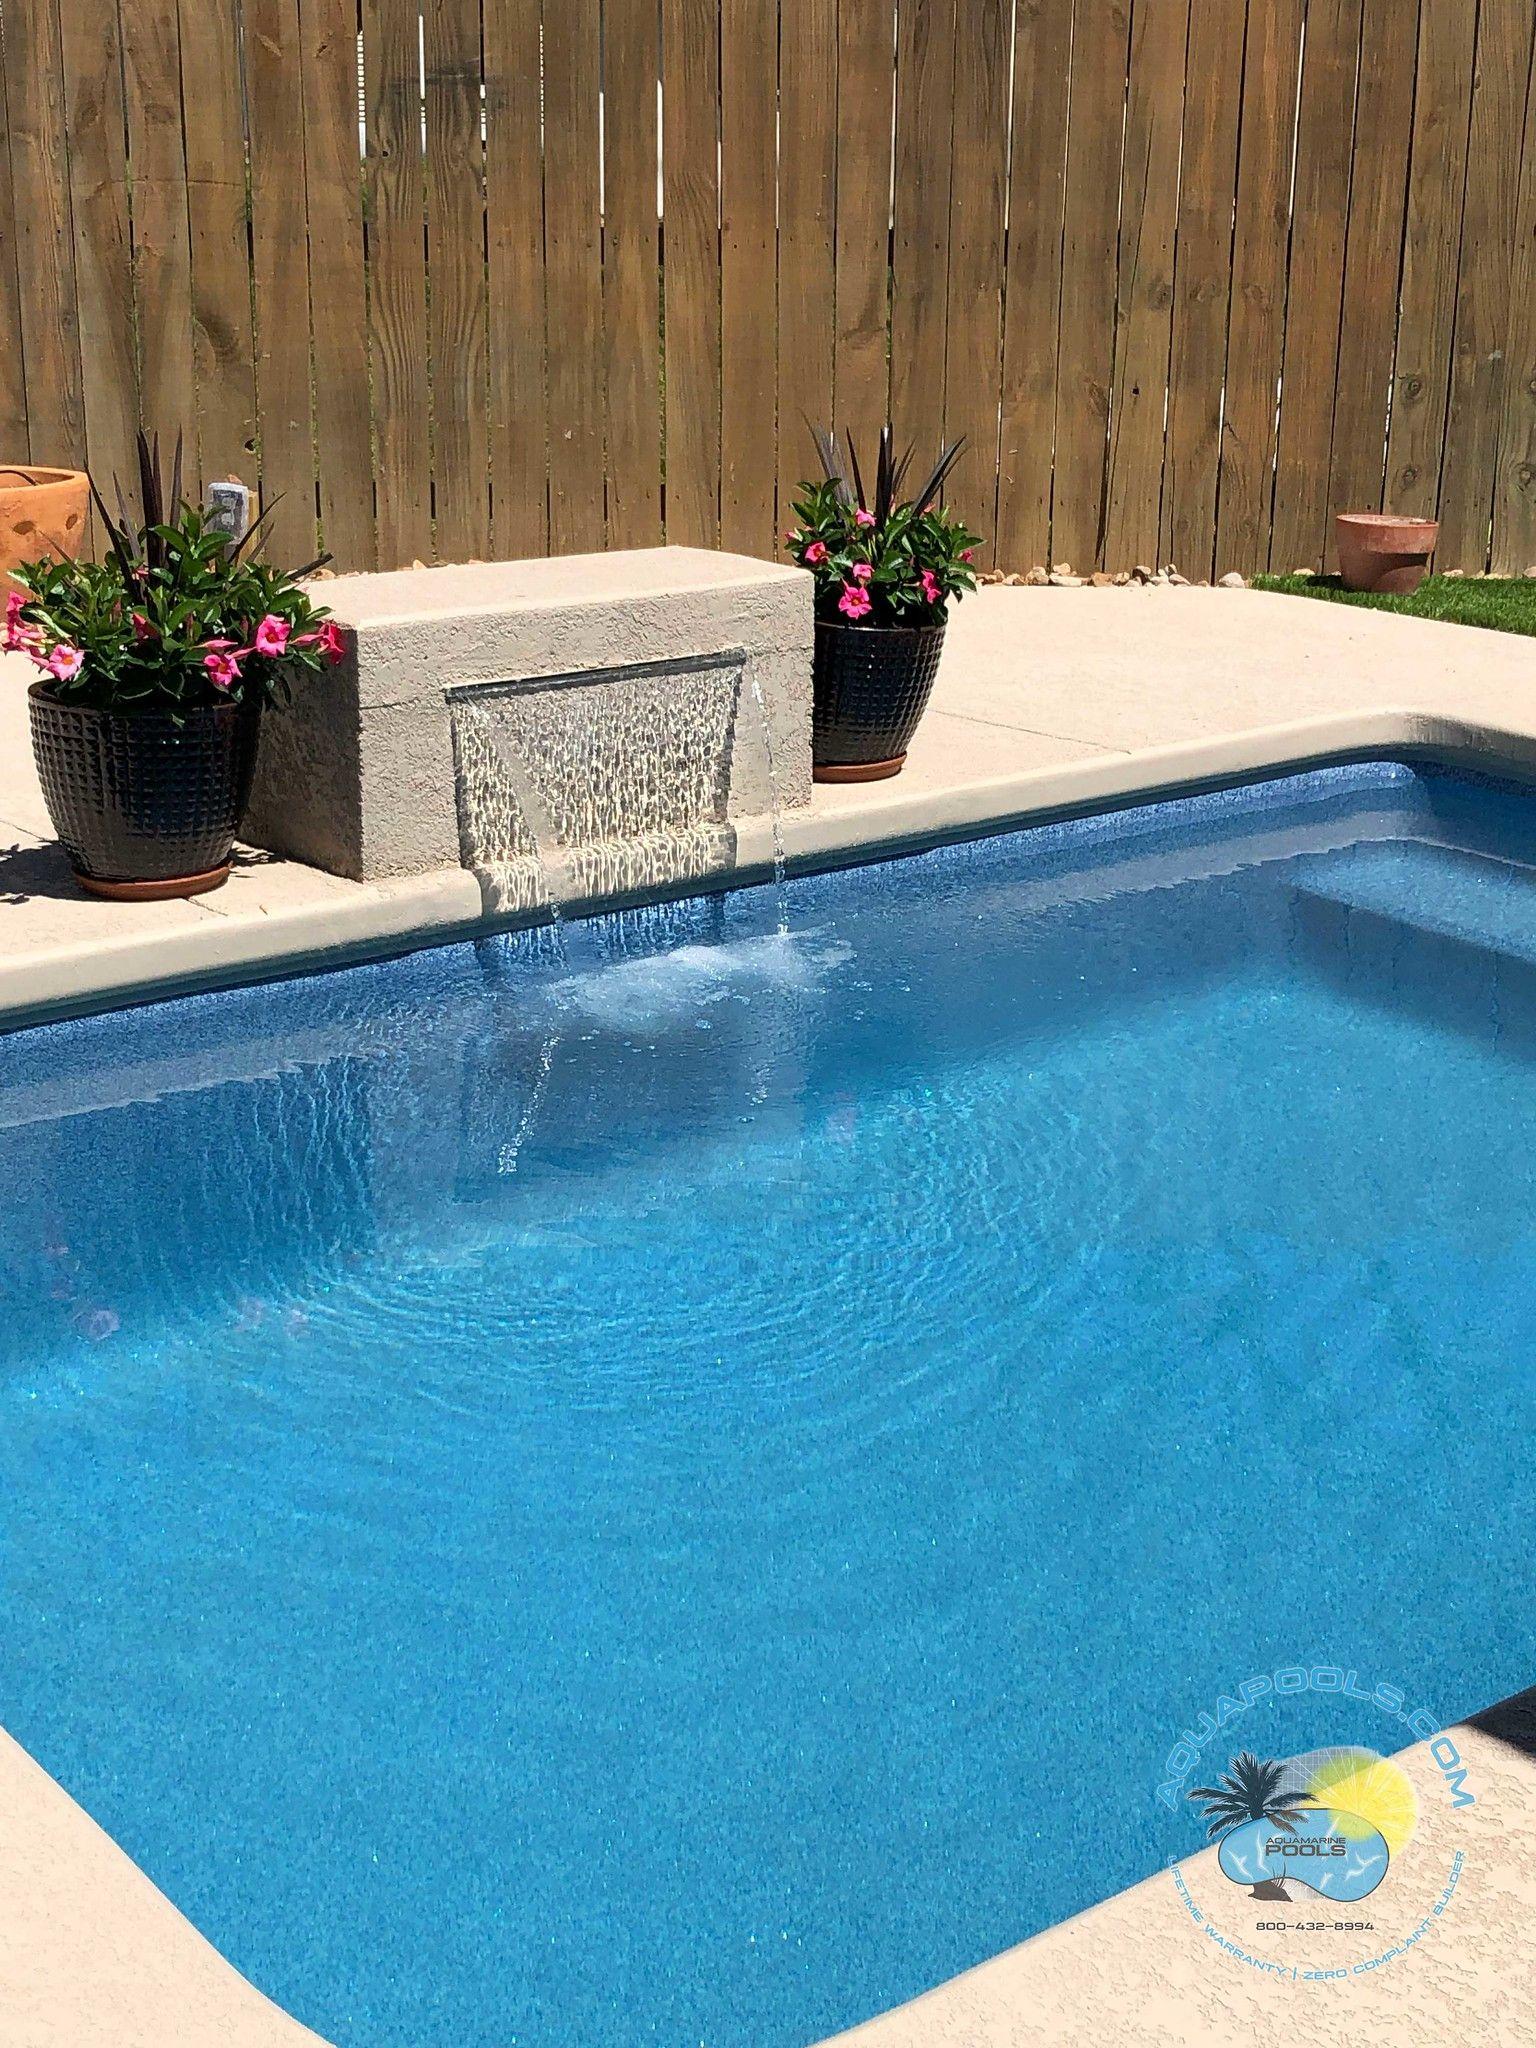 Aquamarine Pools Tropicana Sapphire Blue Fredericksburgtx 0419 2 Water Feature Wall Pool Pool Designs